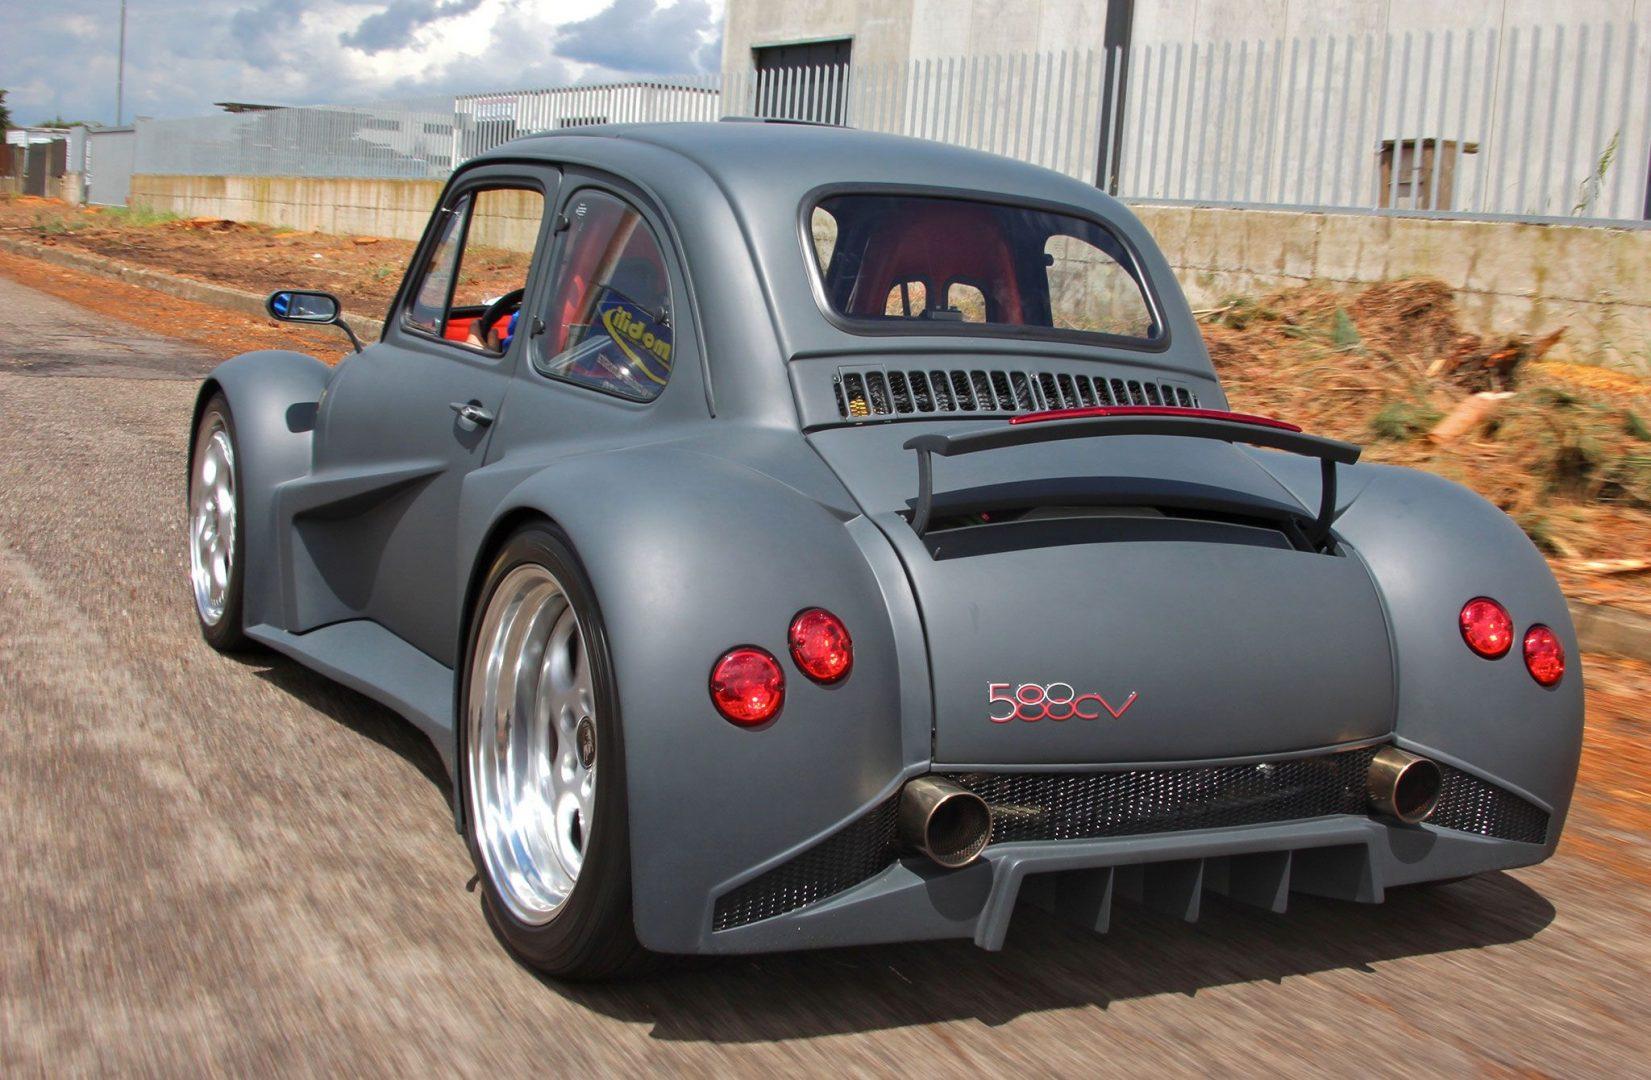 Fiat Rear View